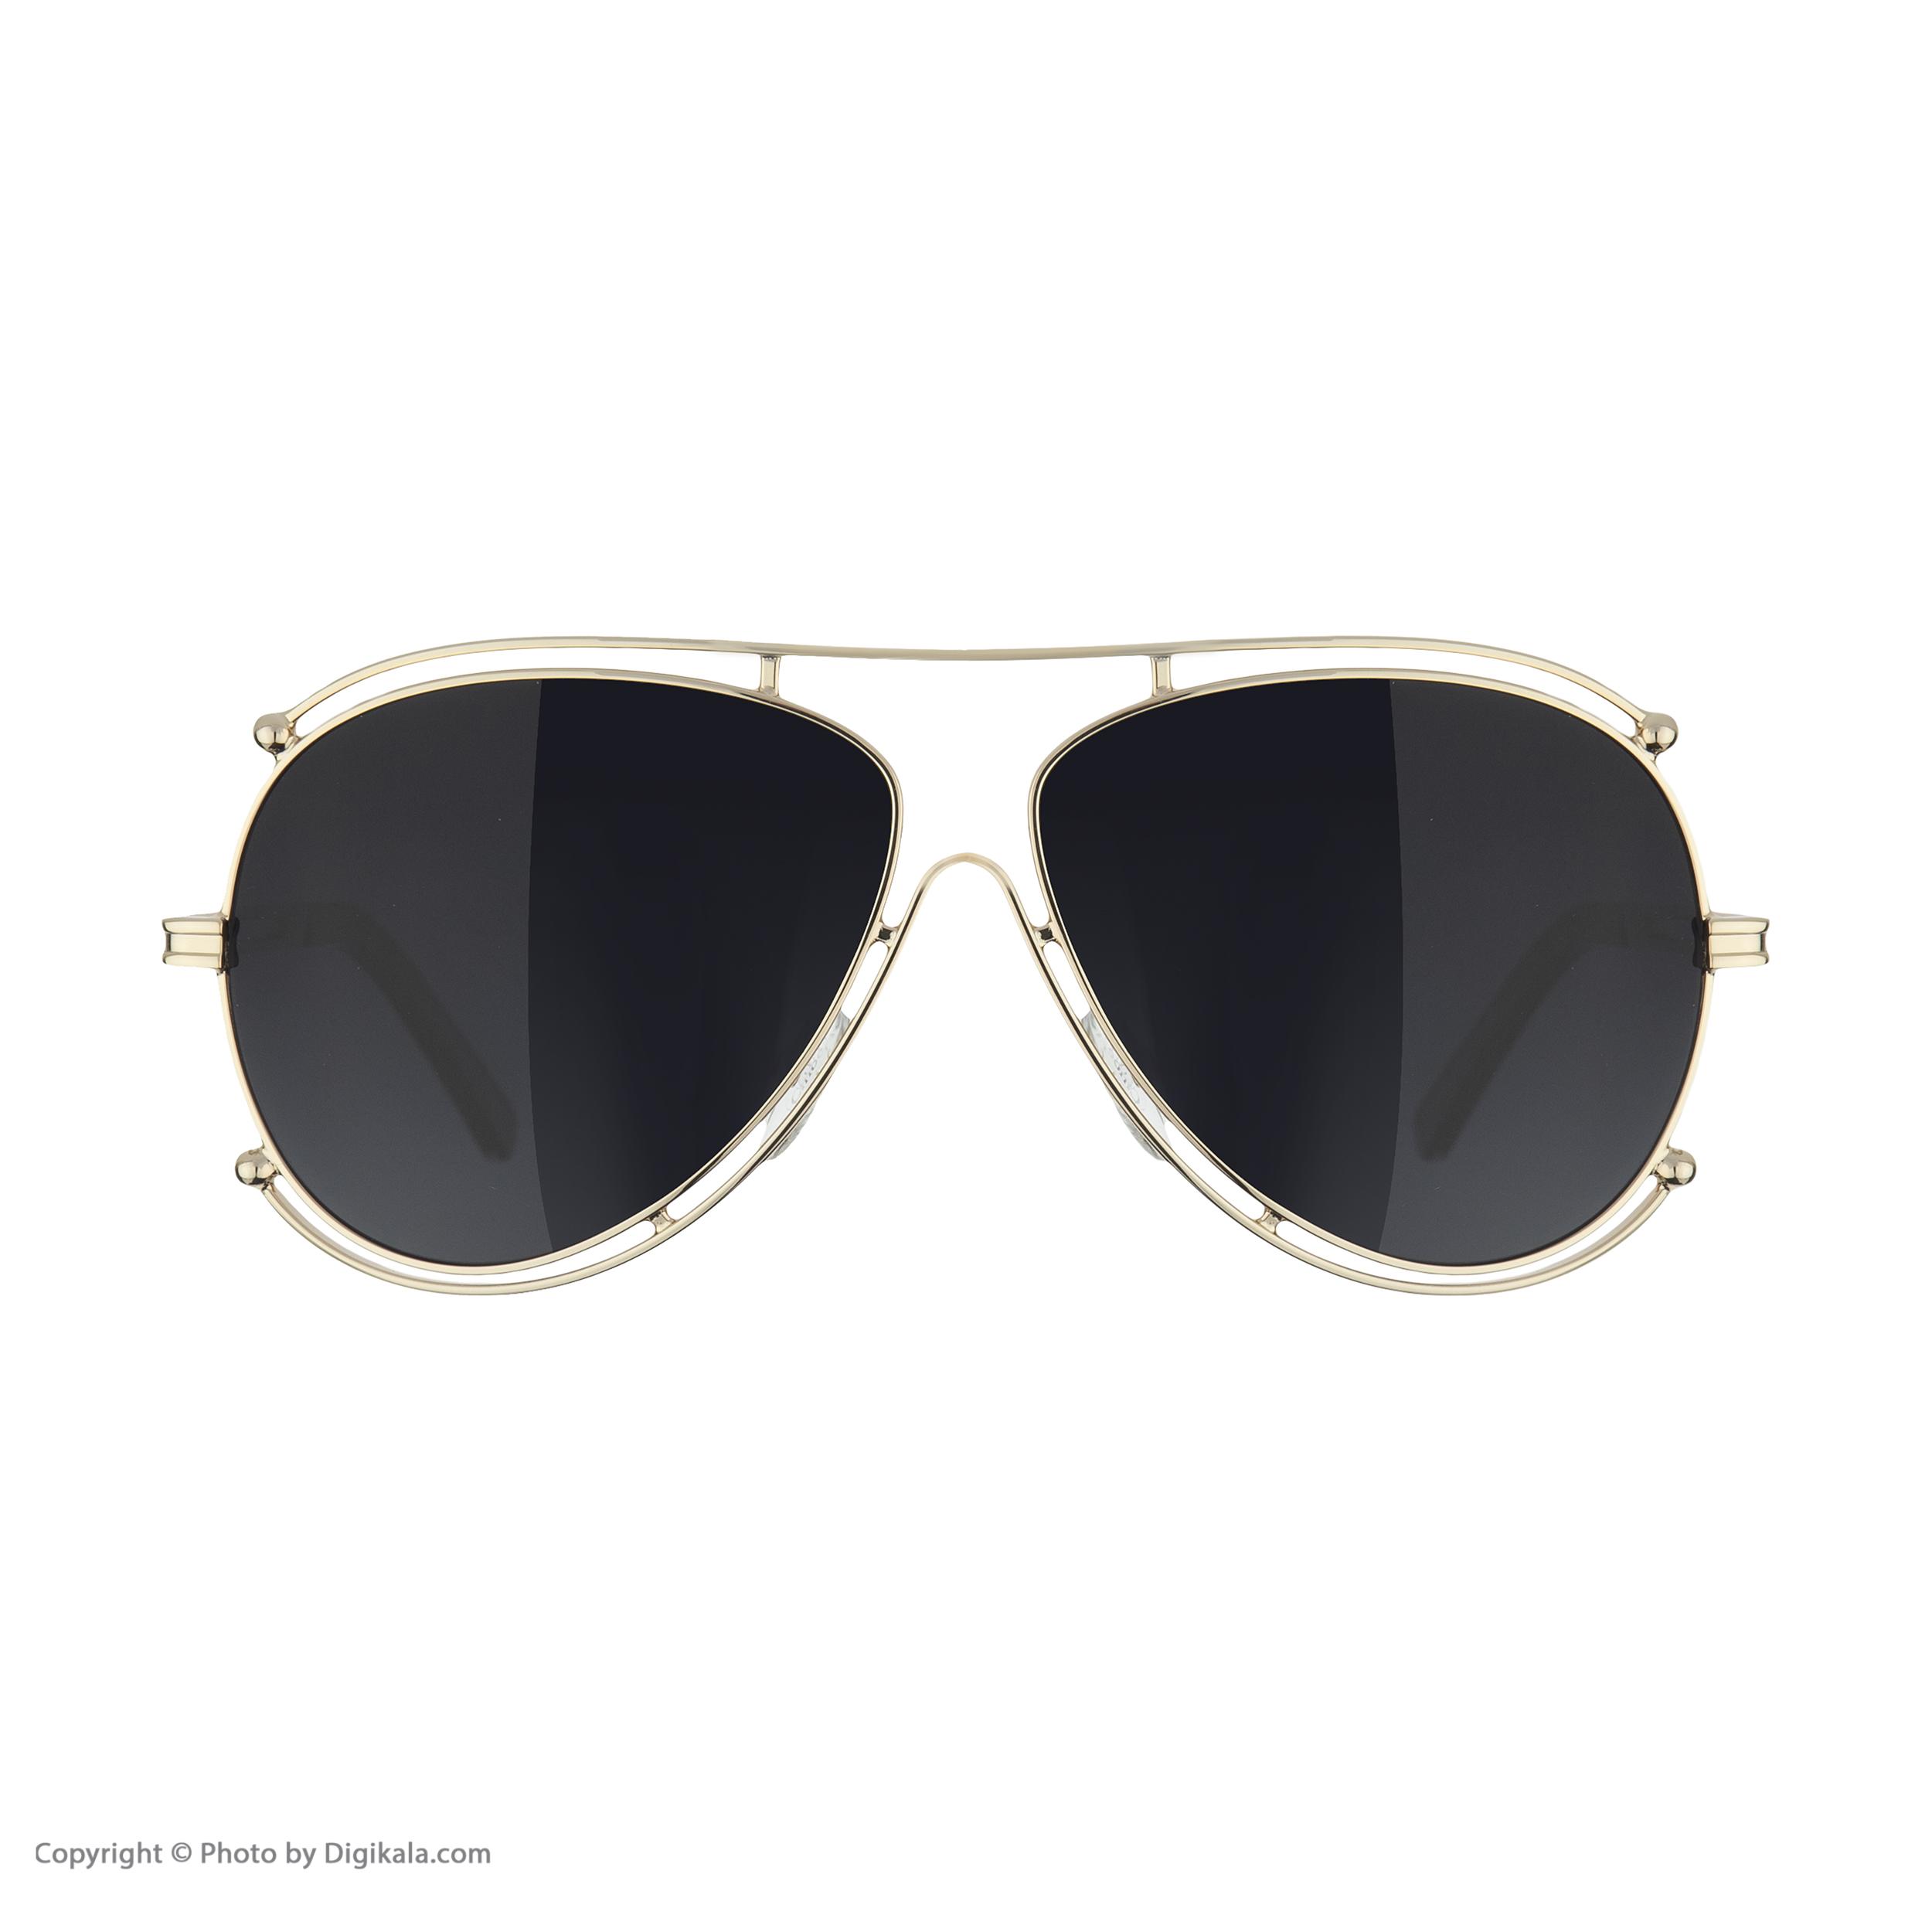 عینک آفتابی کلویی مدل 121s -  - 3